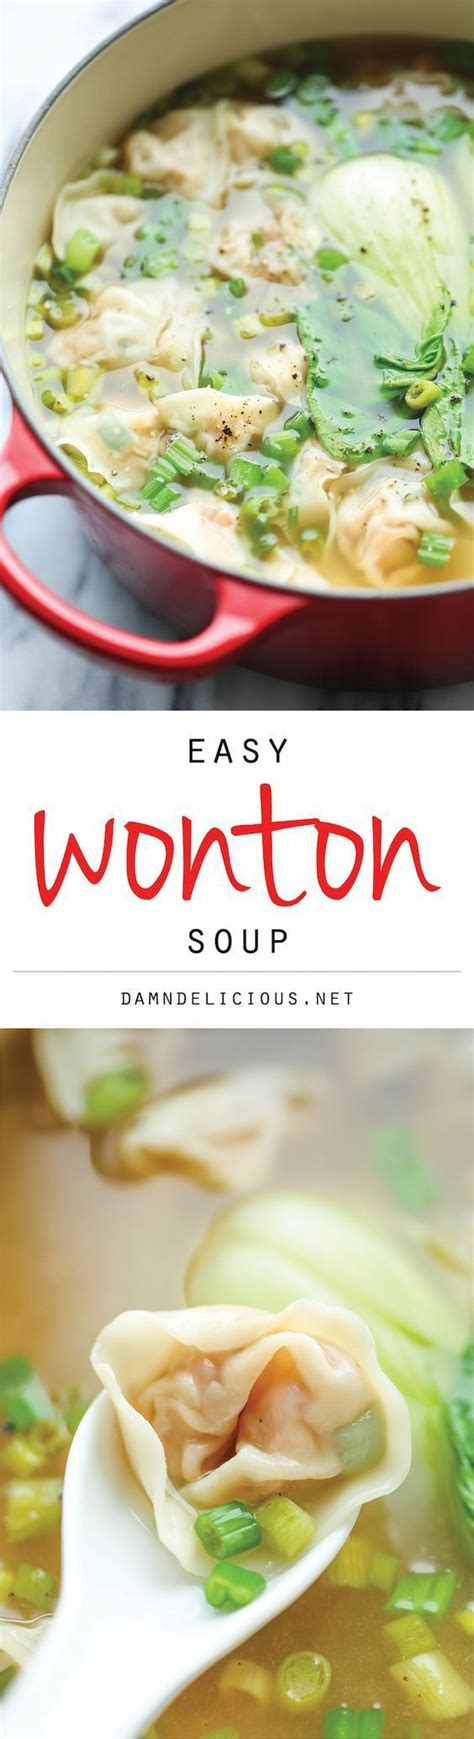 Damn Delicious Detox Chicken Soup by 100 Wonton Soup Recipes On Wontons Soup